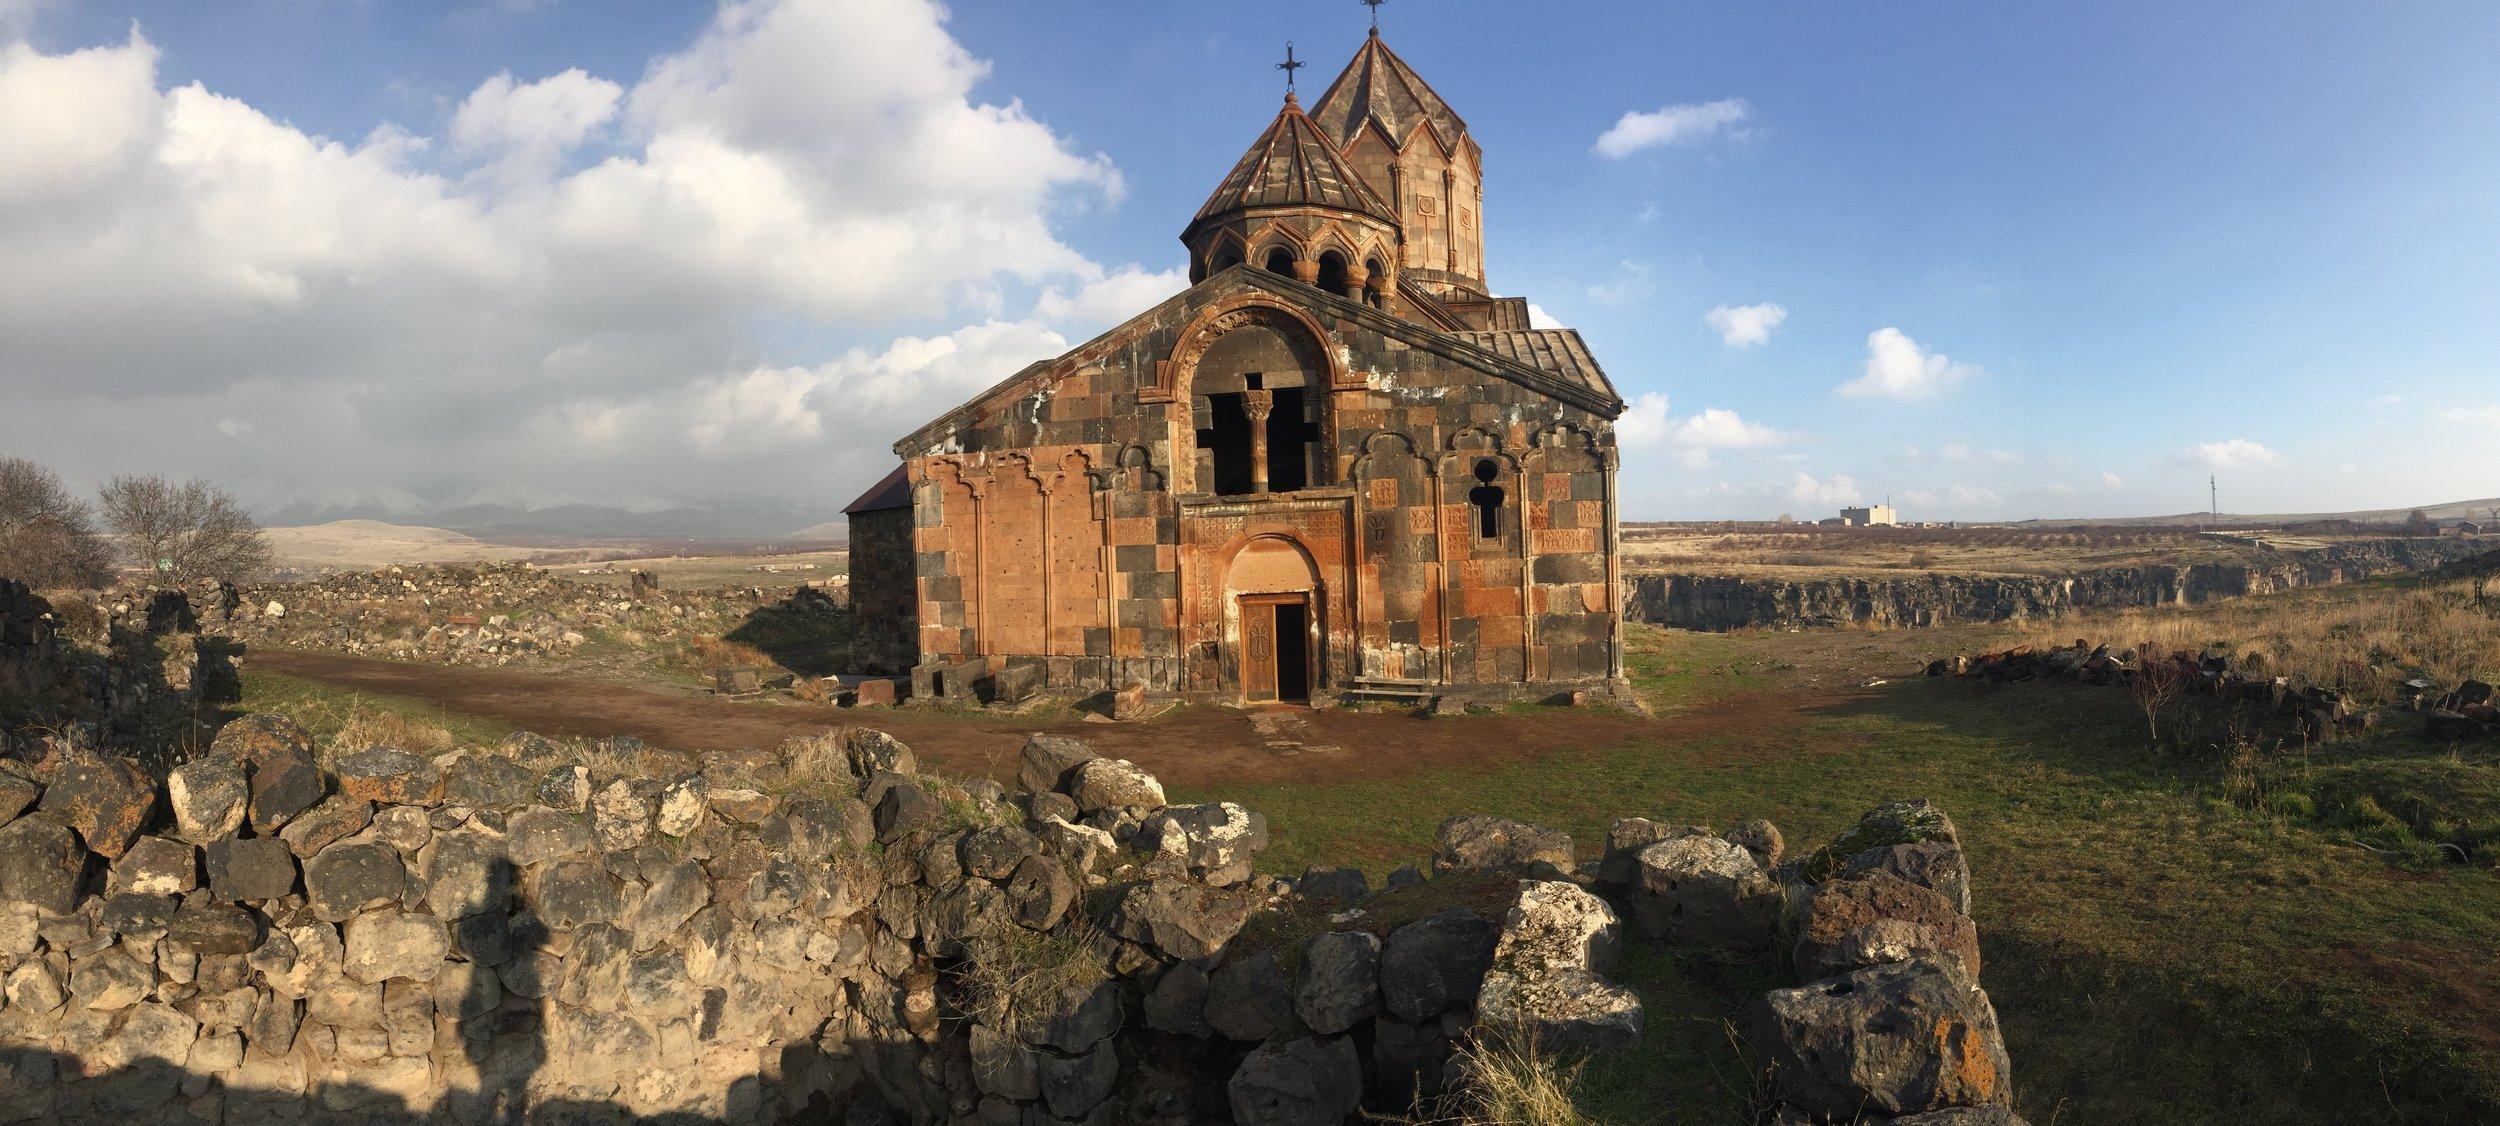 Armenia-2018-128-min.jpg